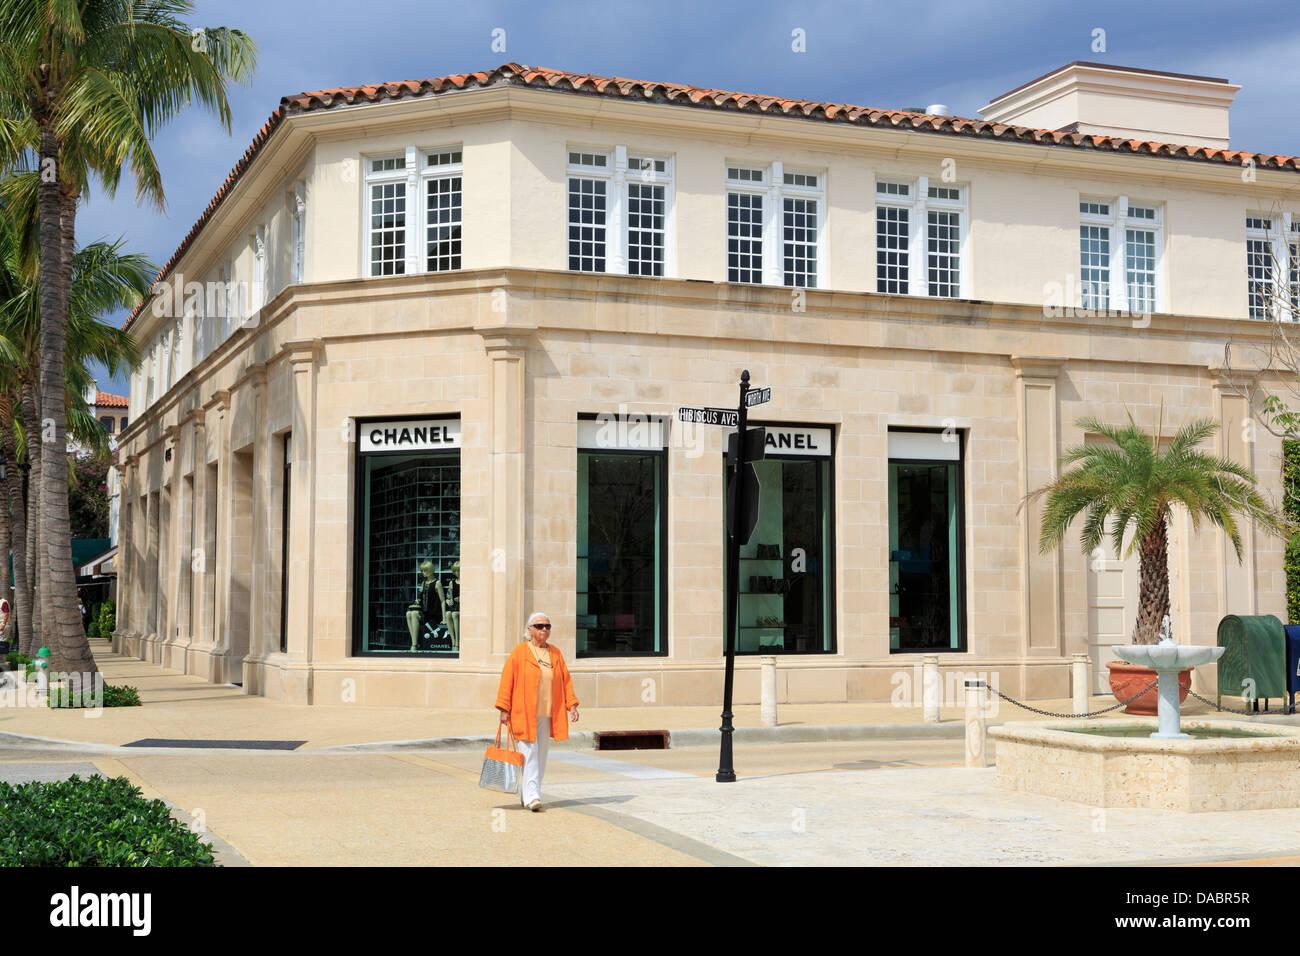 Store on Worth Avenue, Palm Beach, Florida, United States of America, North America Stock Photo